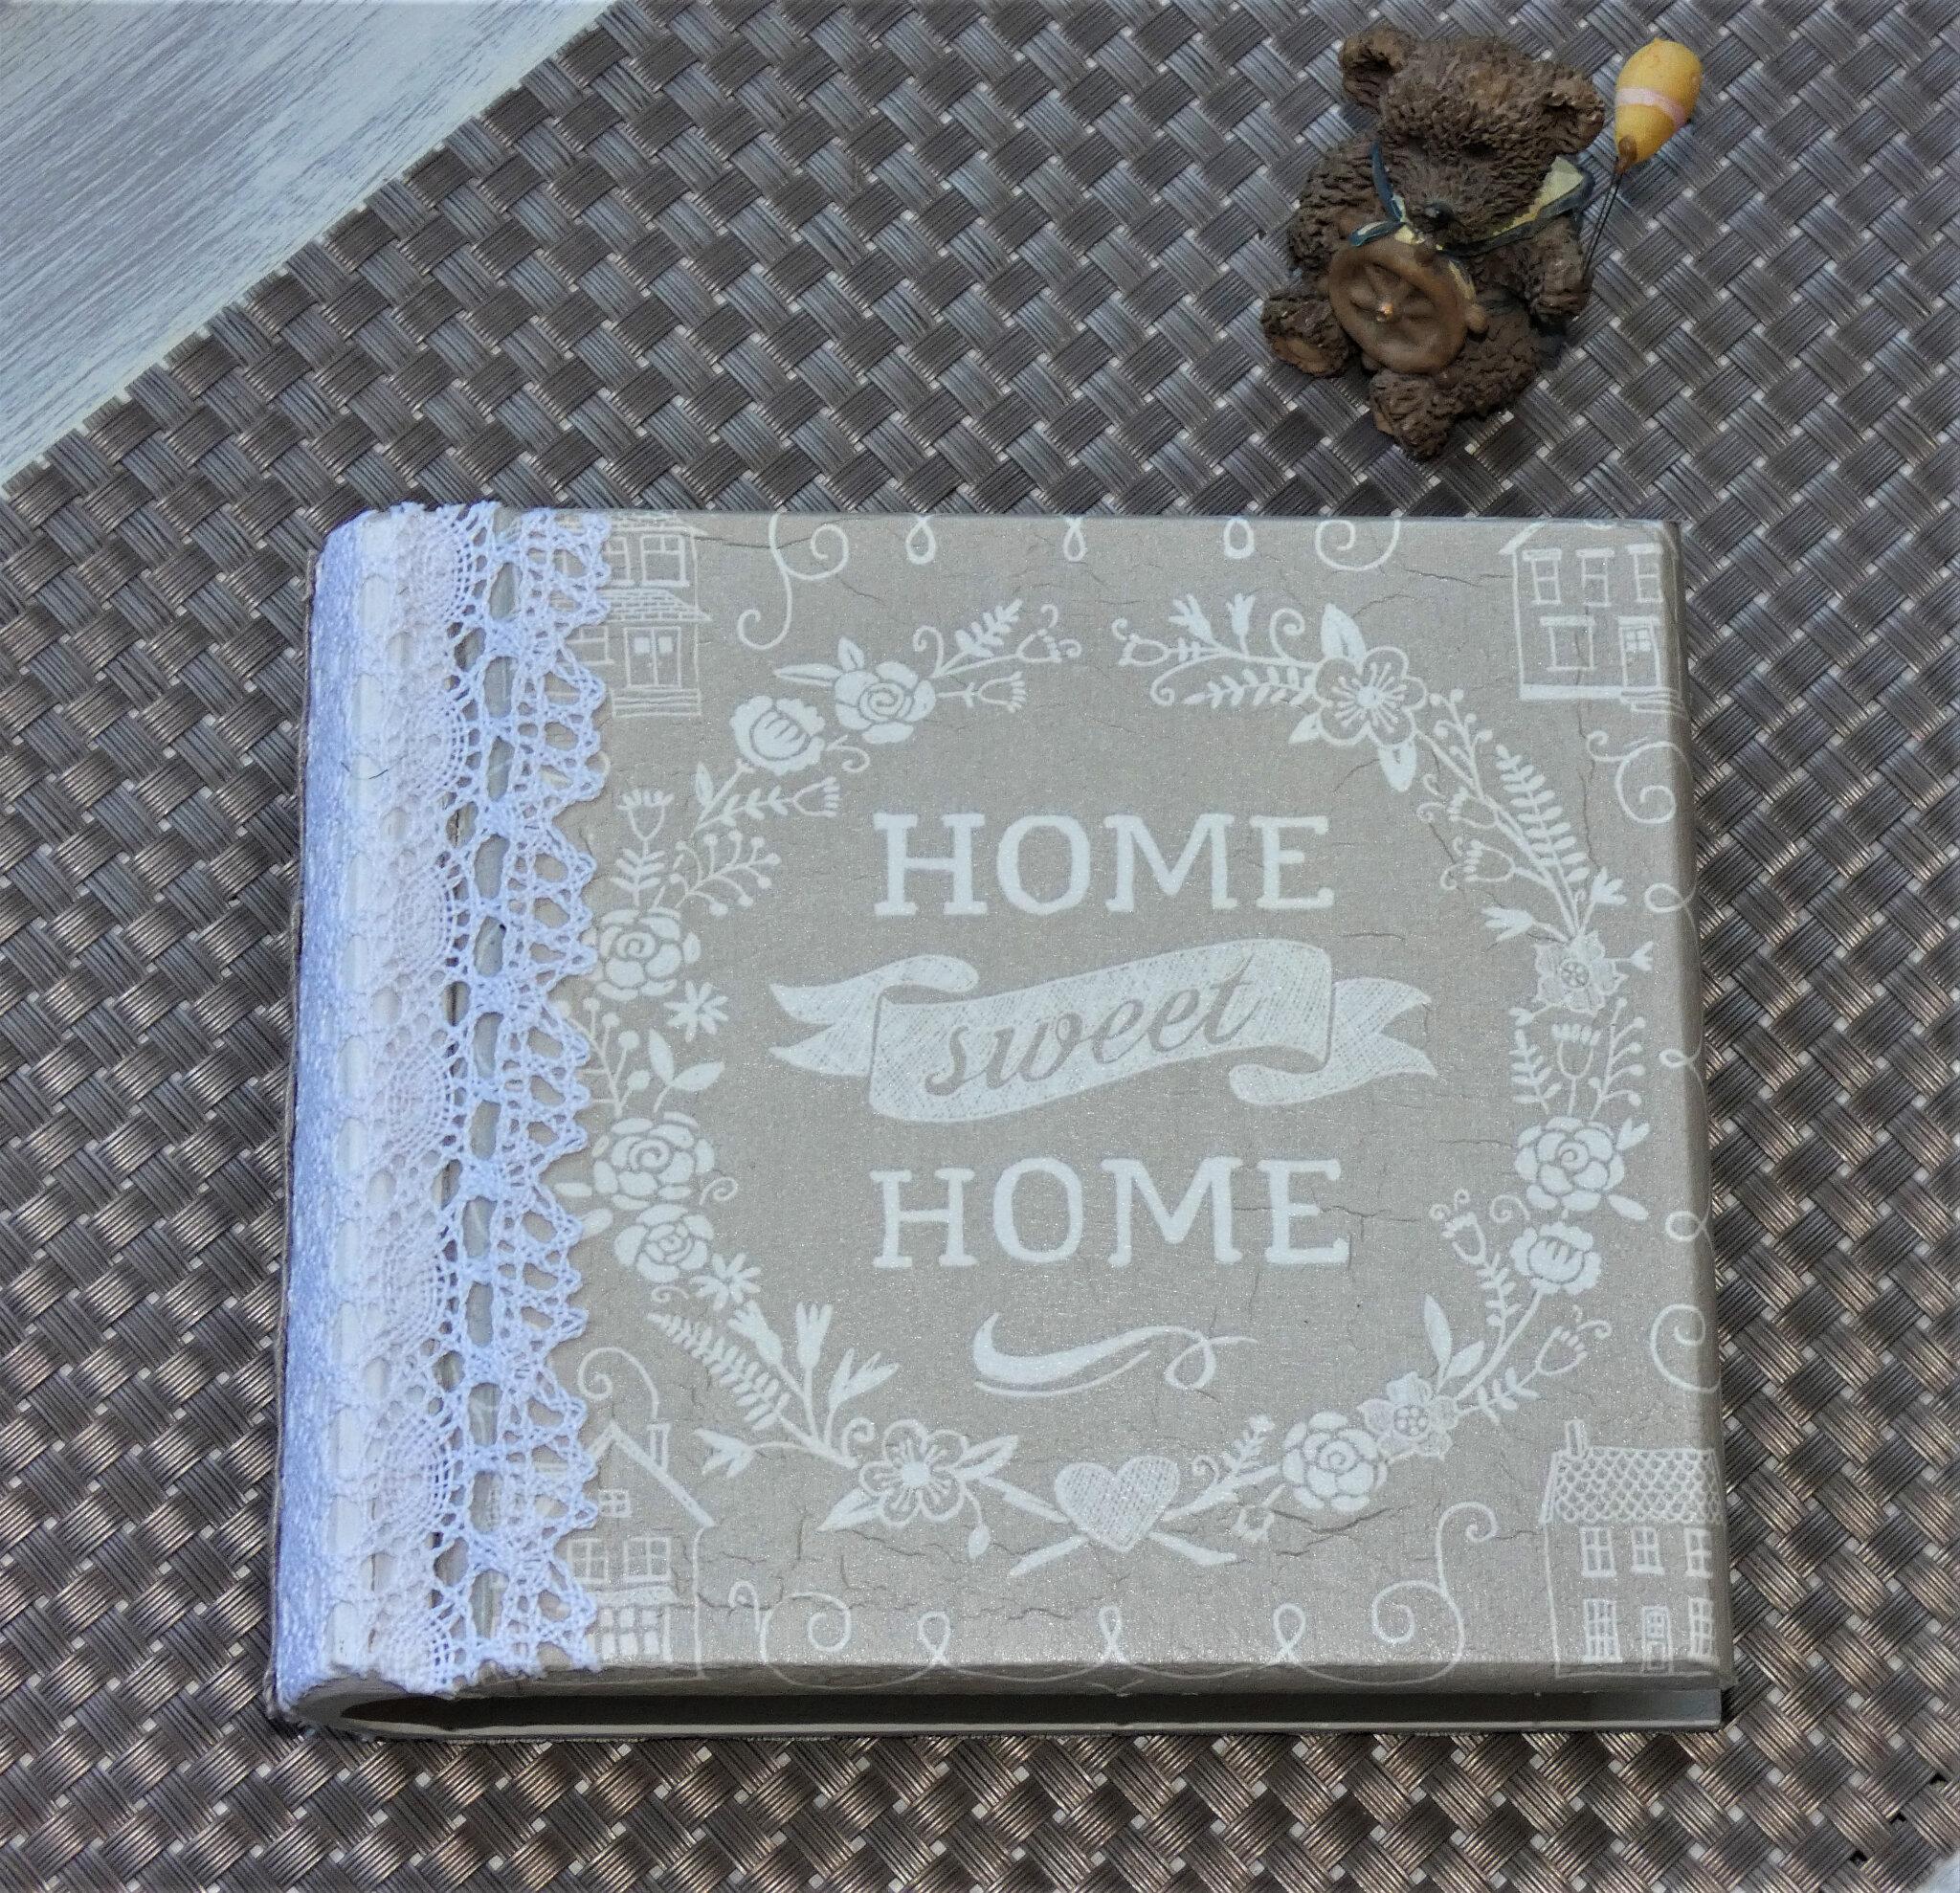 25/03/2019 - Home Sweet Home